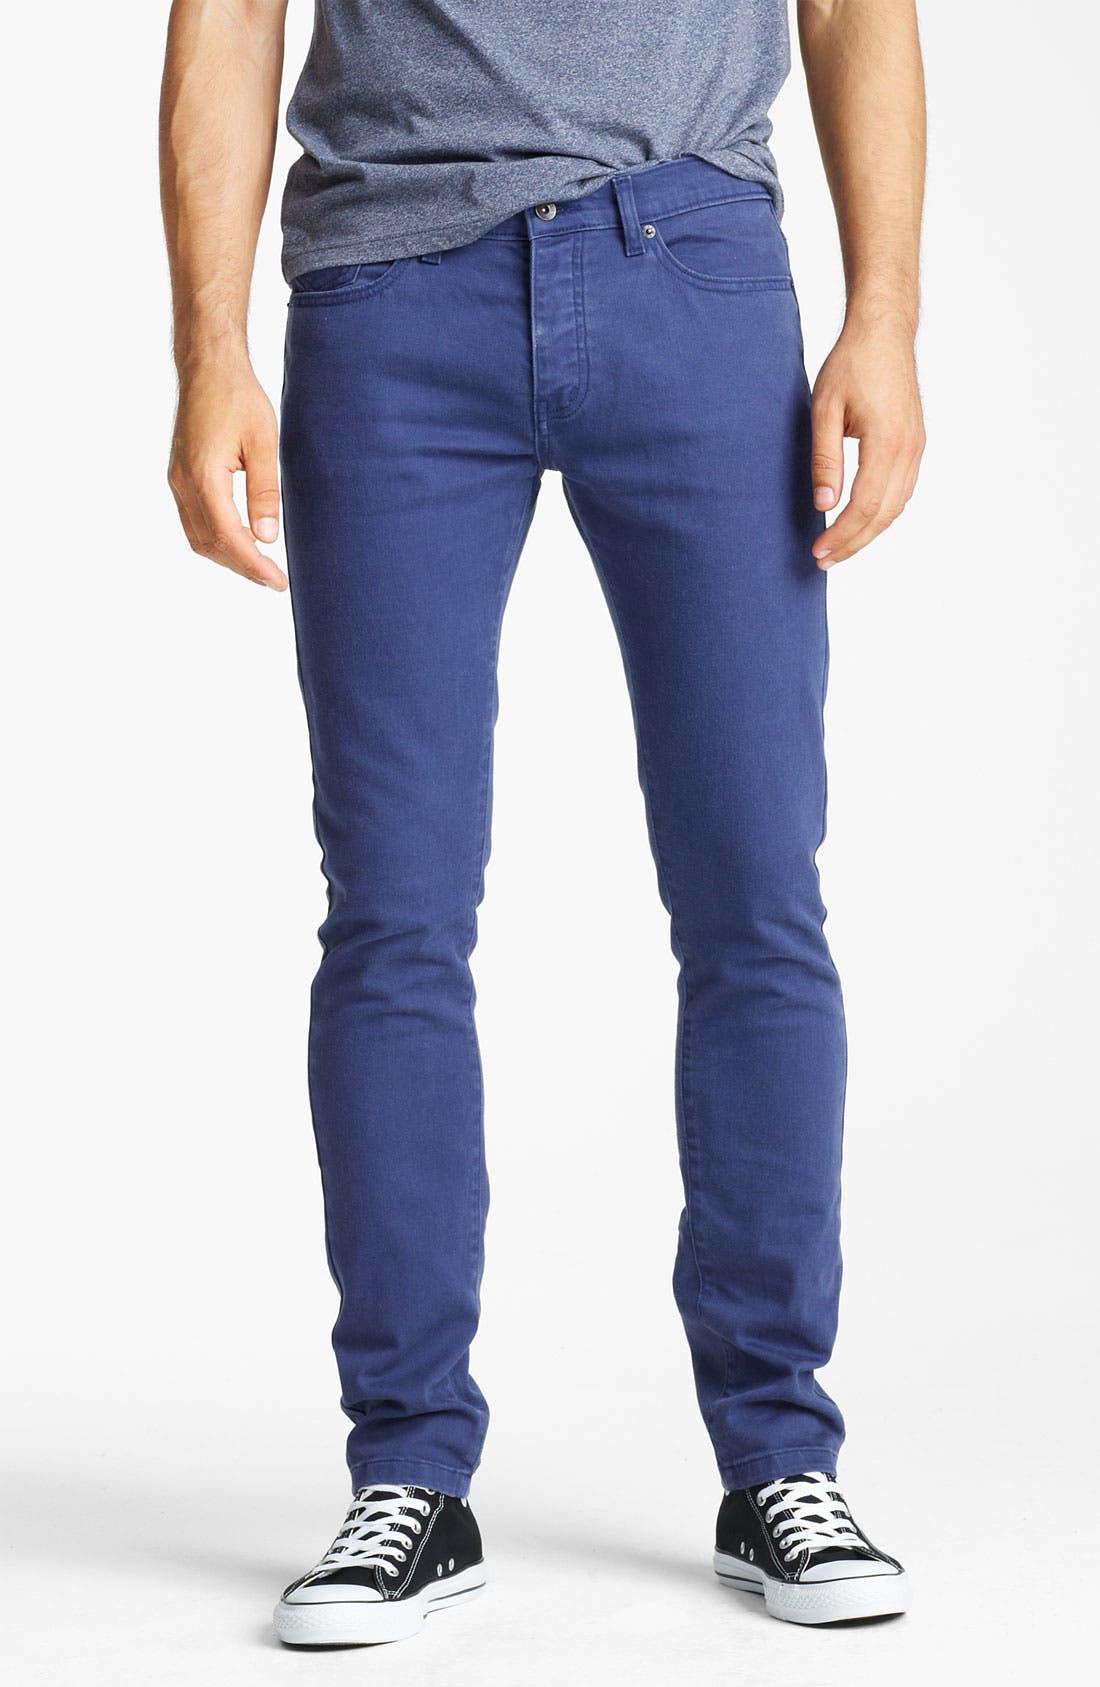 Alternate Image 1 Selected - Topman Stretch Skinny Jeans (Medieval Blue)